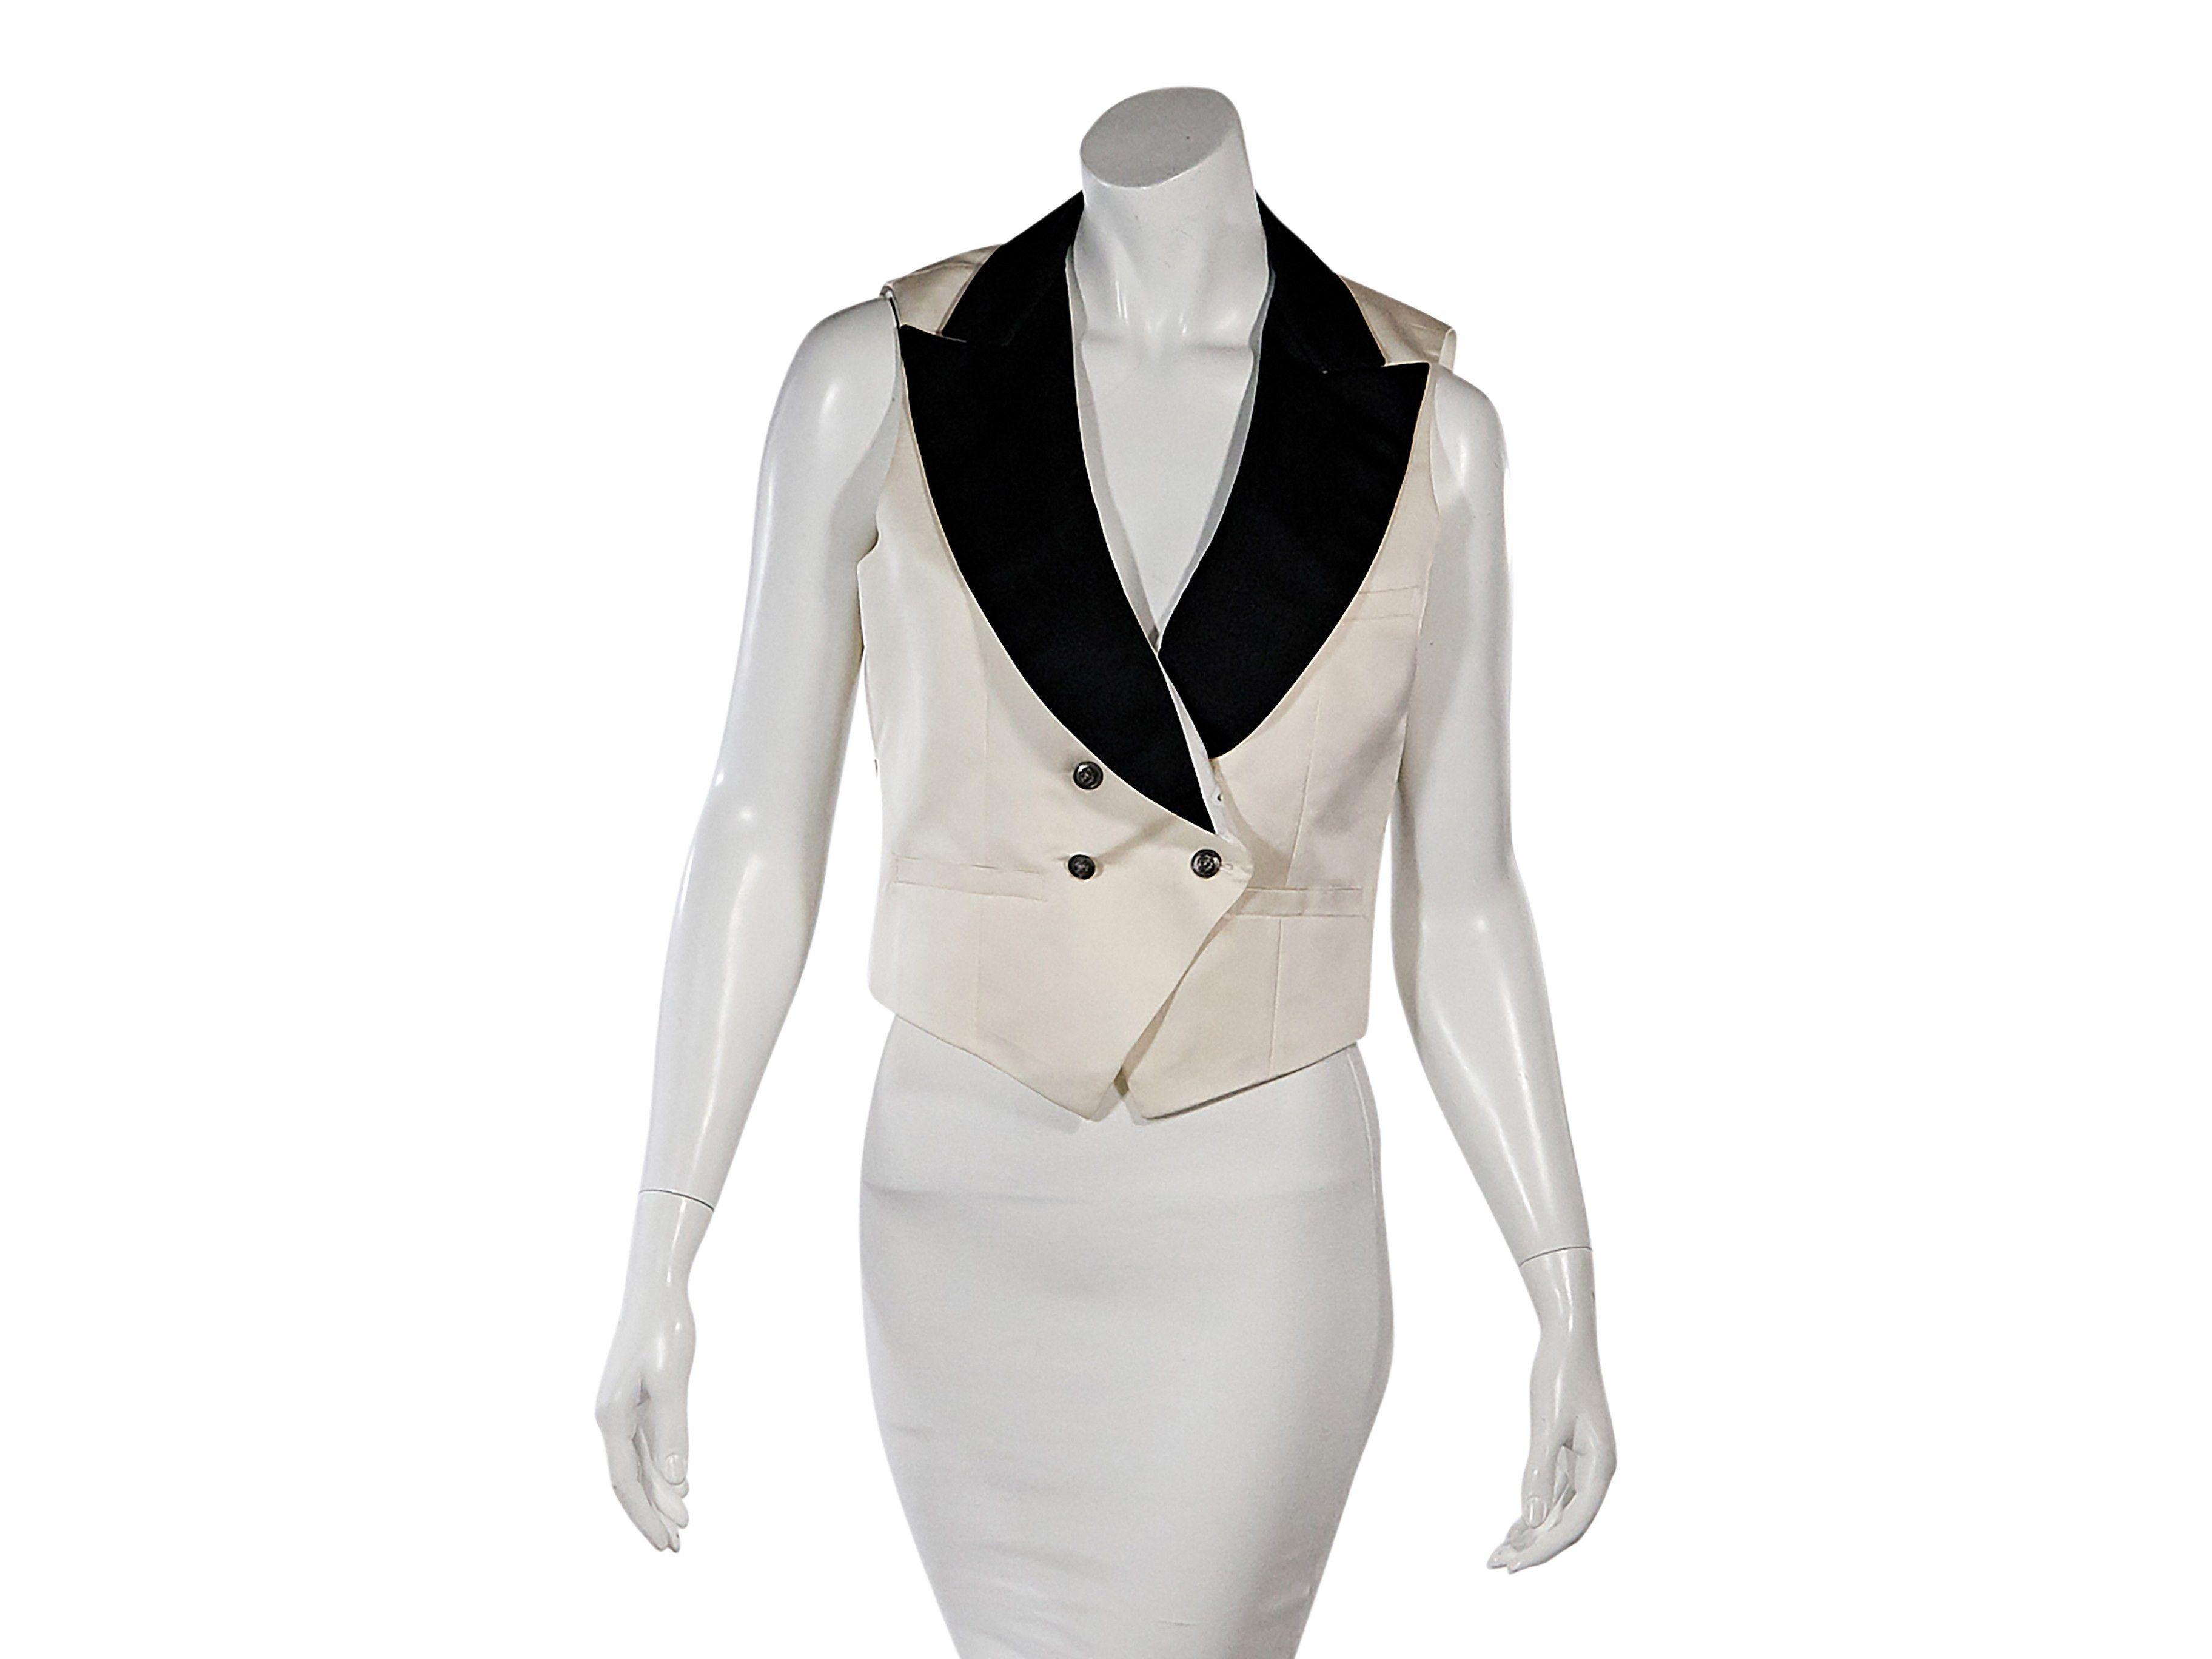 e2e6149d08a0 White & Black Chanel Tuxedo Vest | Products | Tuxedo vest, Tuxedo ...